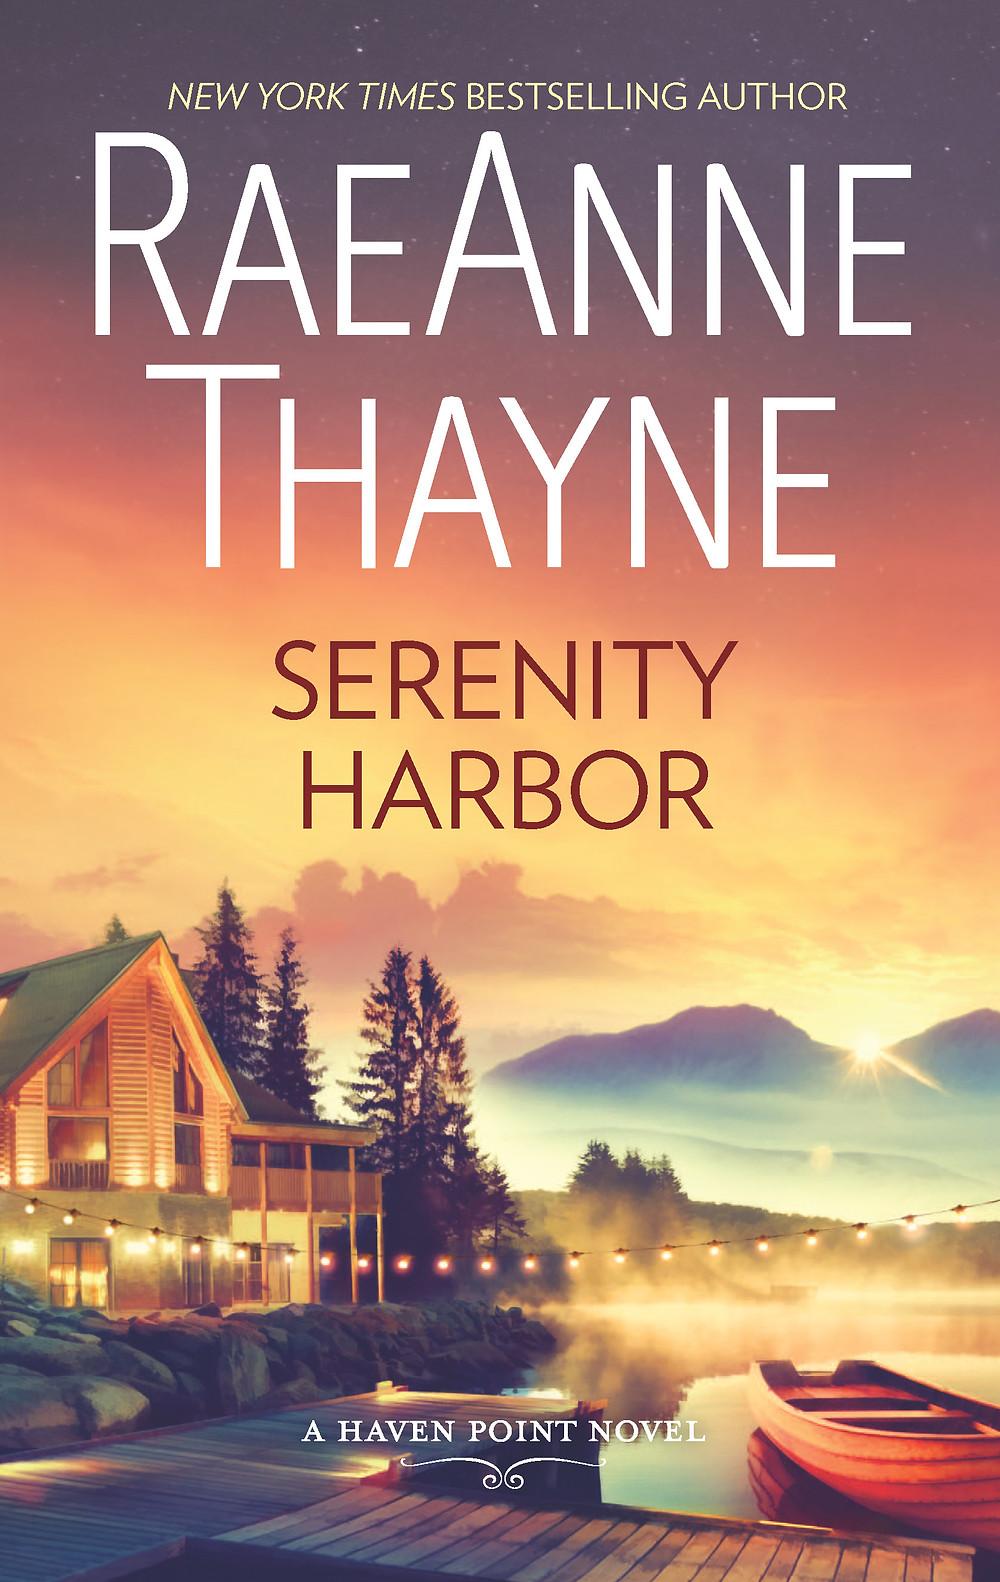 SERENITY HARBOR by RaeAnne Thayne